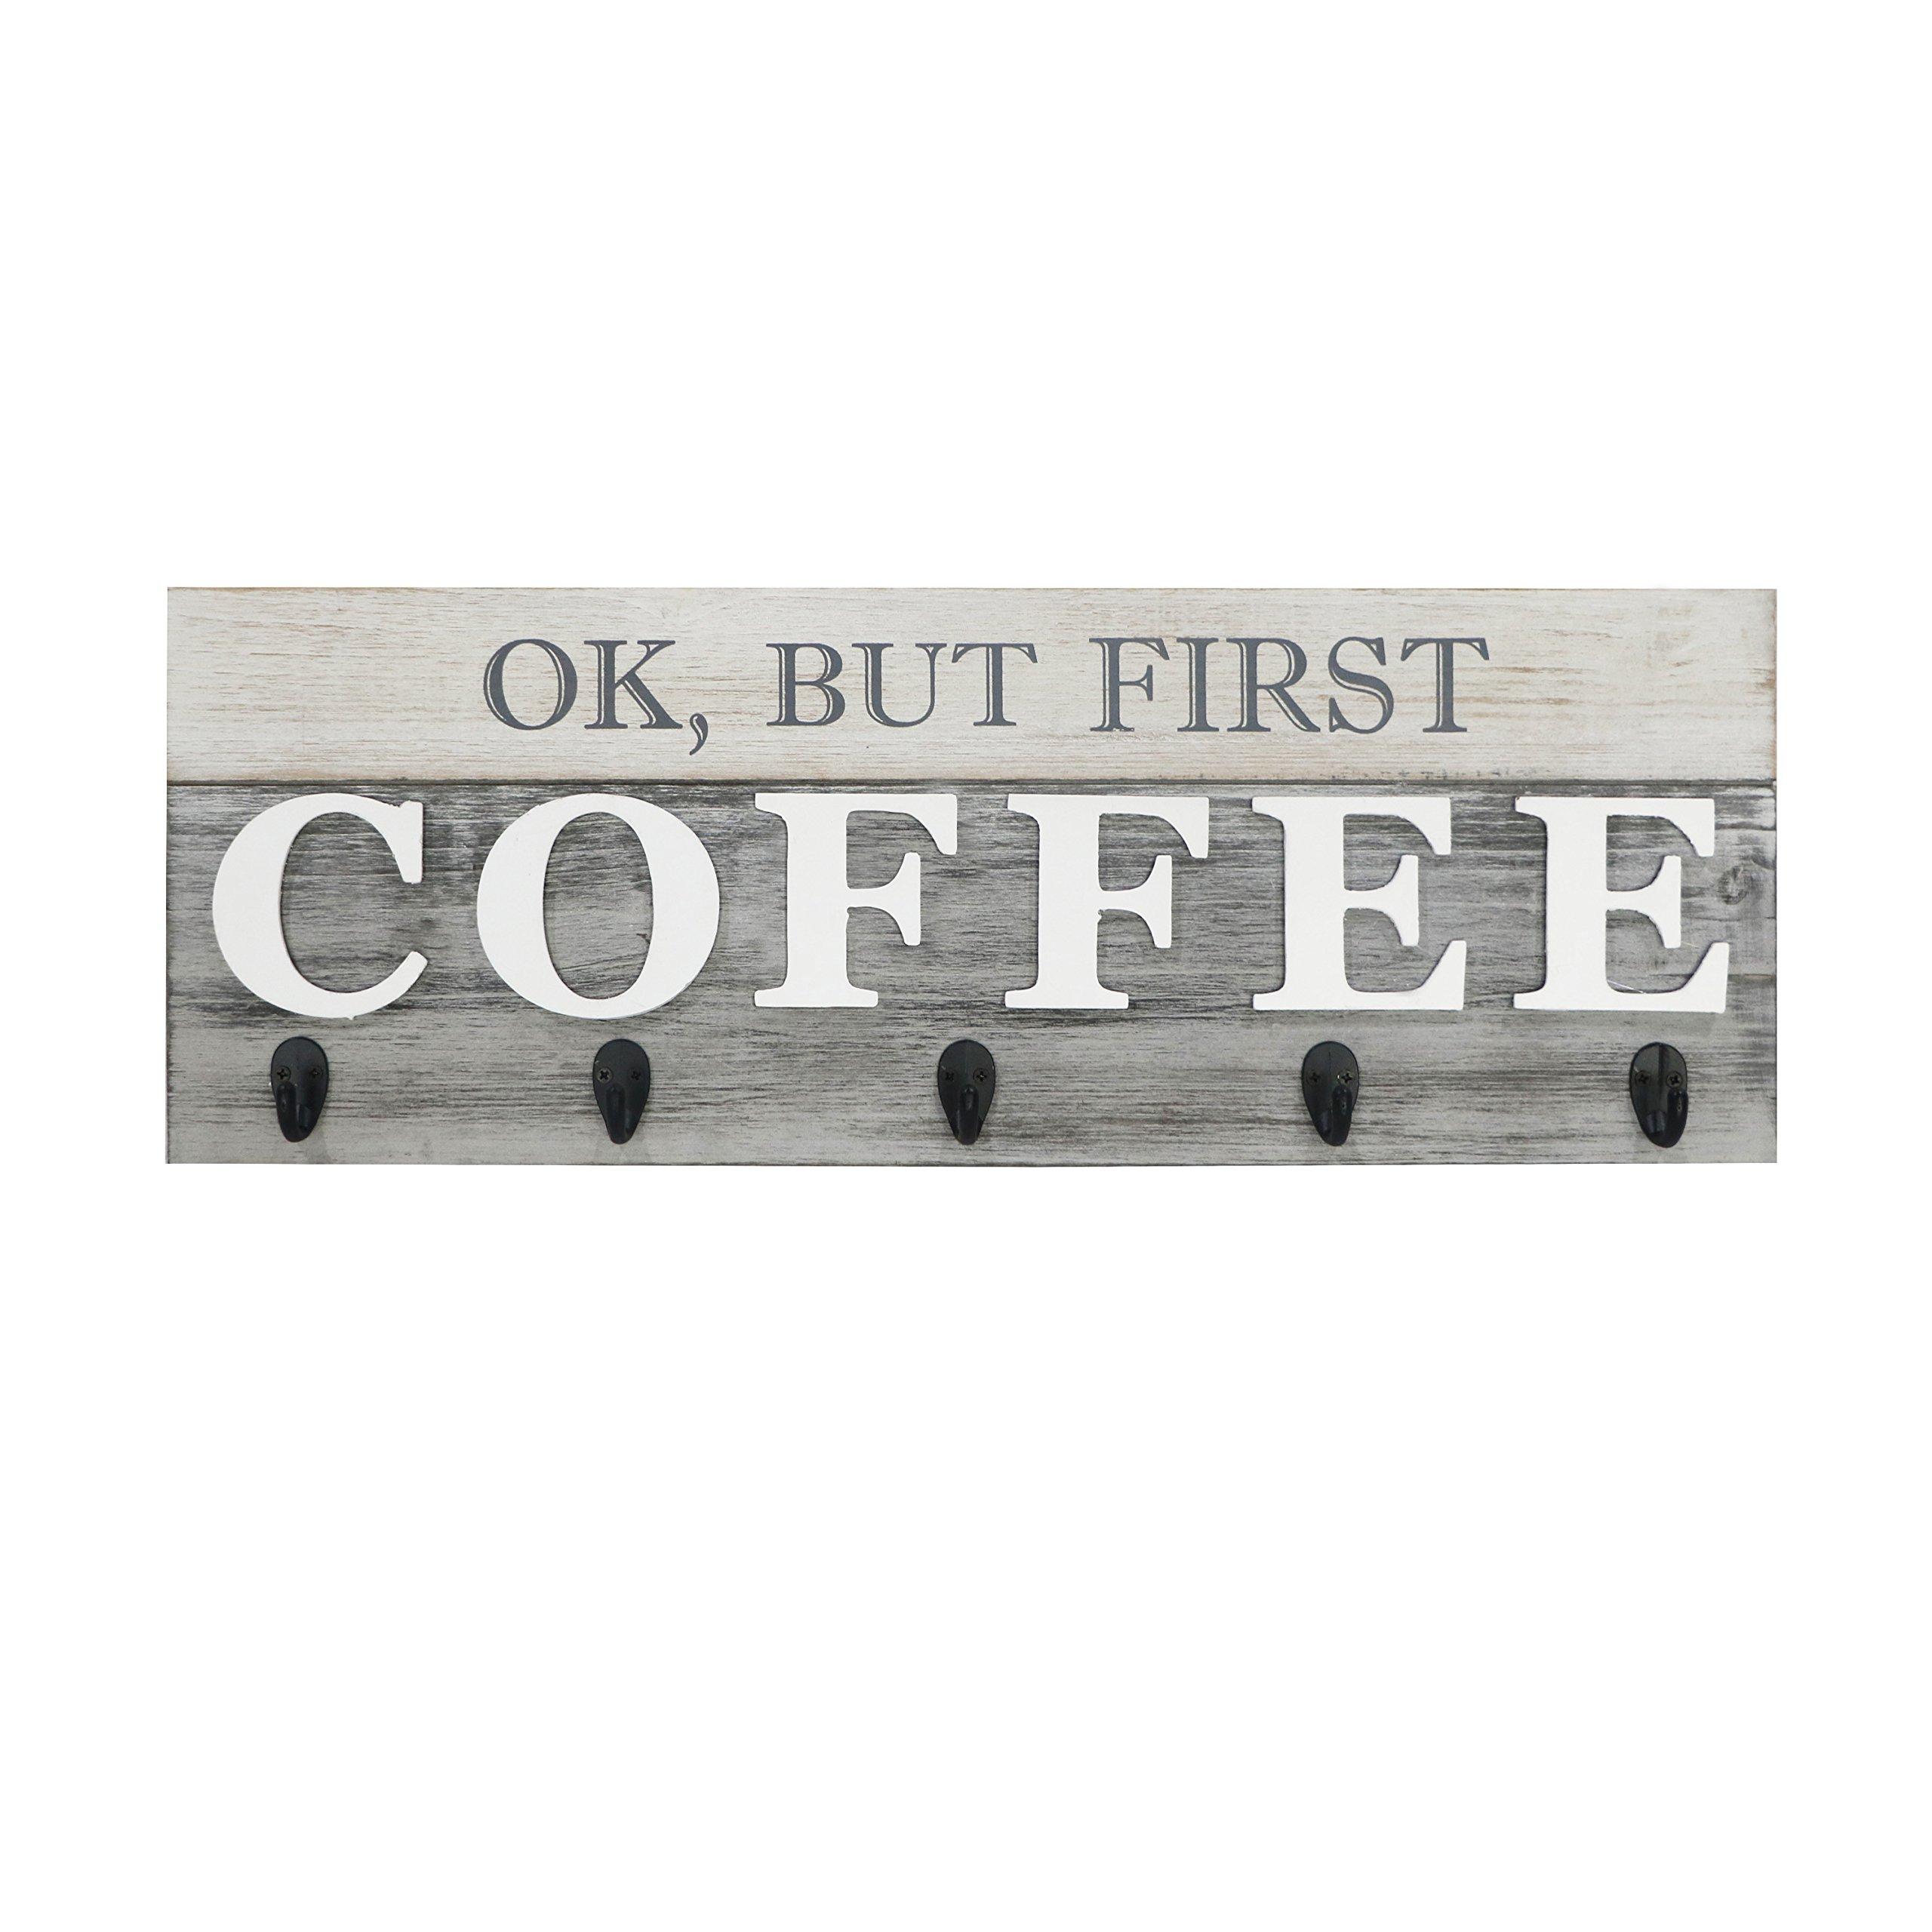 Barnyard Designs 'Ok, But First Coffee' Mug Holder - Rack - Display, Rustic Farmhouse Wood Coffee Wall Decor Sign for Kitchen, Bar, Cafe 24'' x 8.5'' by Barnyard Designs